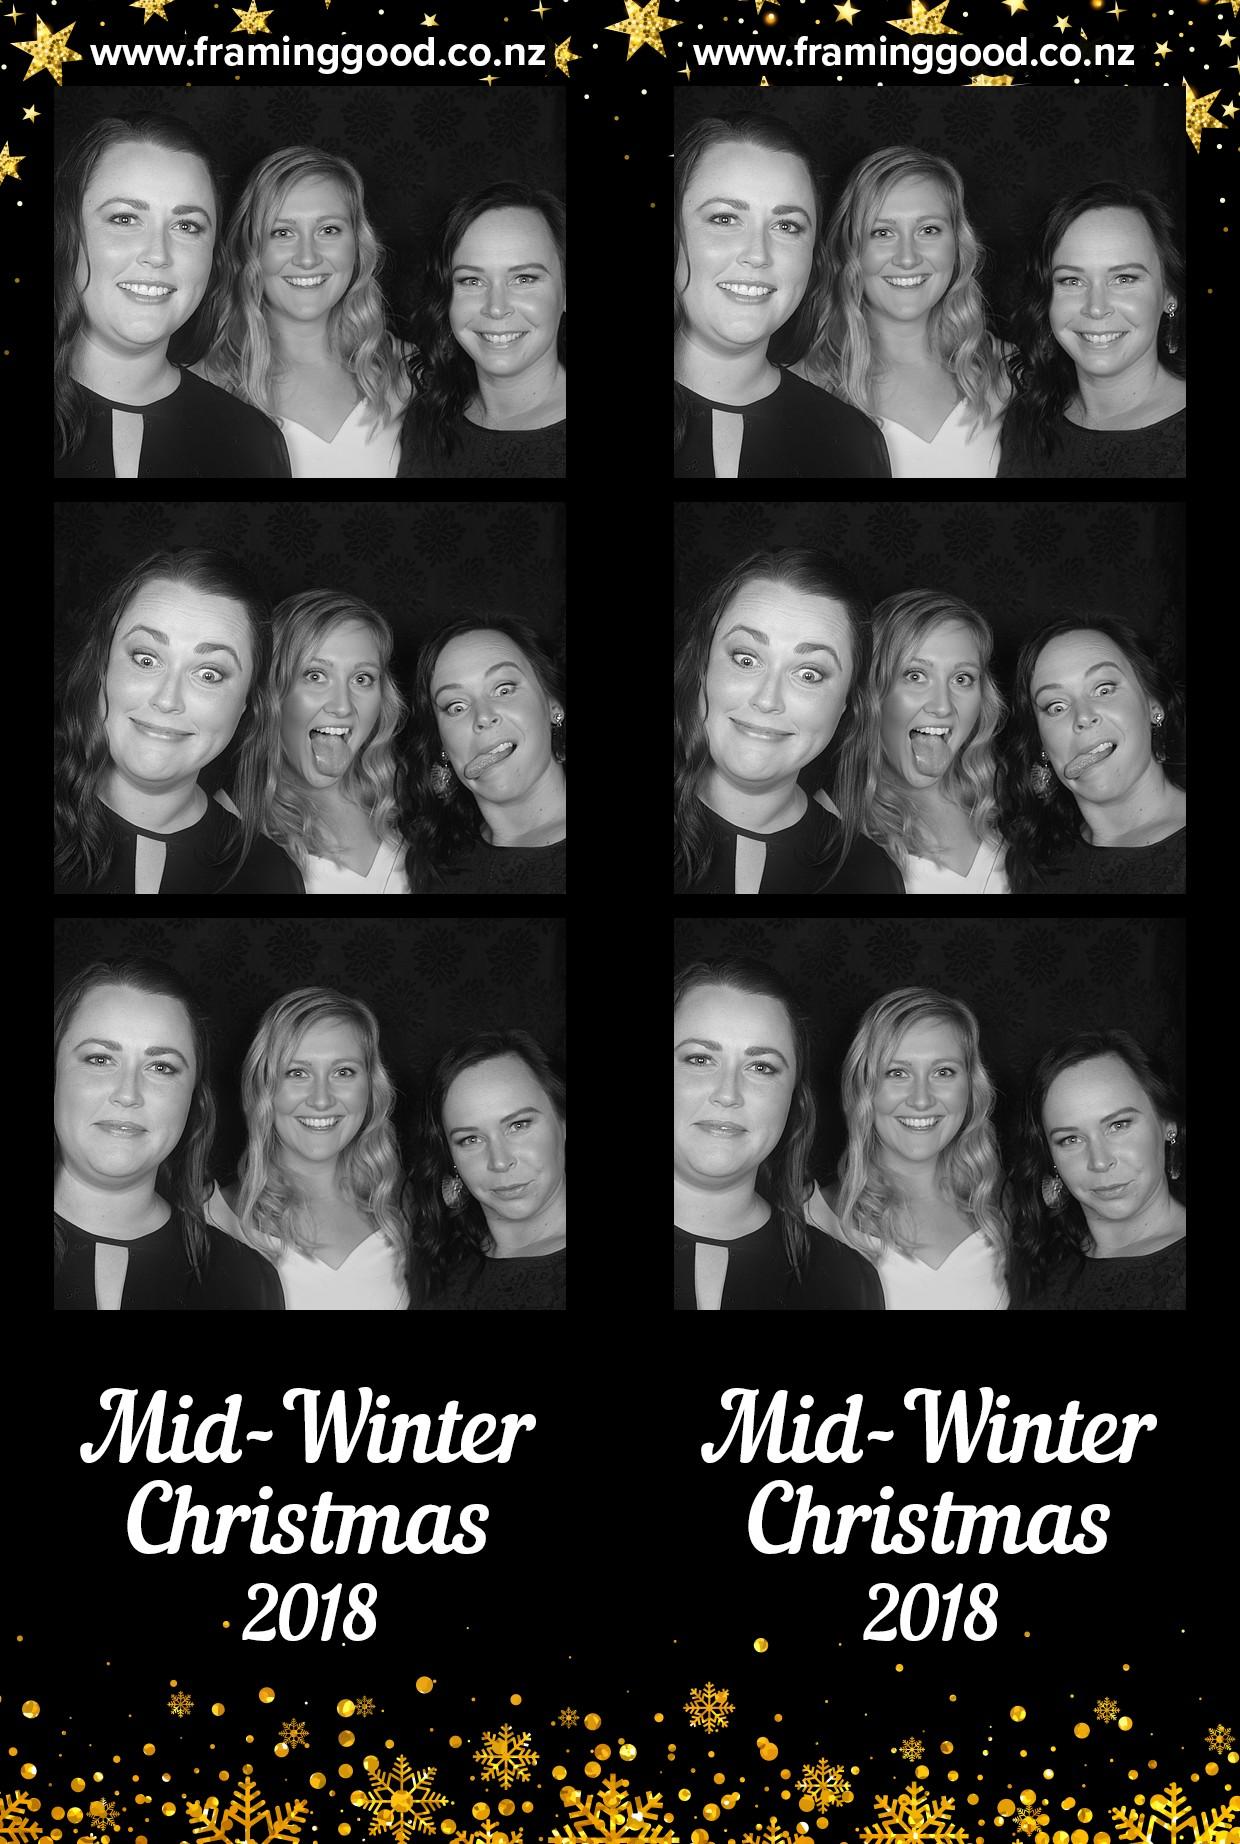 Framing Good Photo Booth_Mid Winter Christmas.jpg